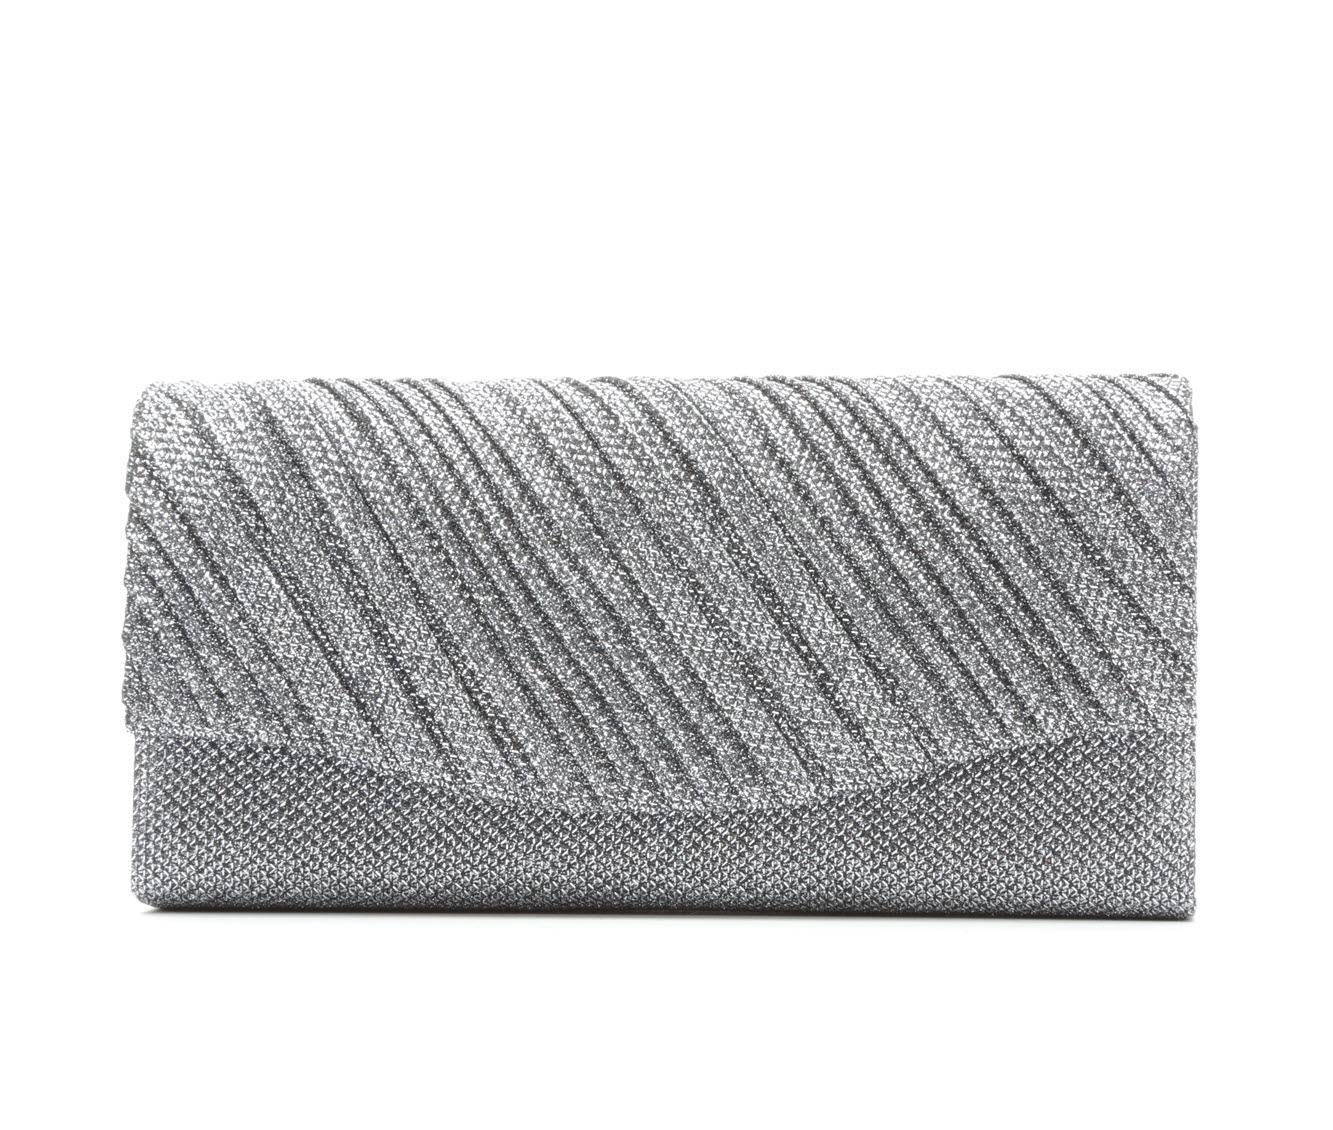 Image of Four Seasons Handbags Small Diagonal Stripe Clutch